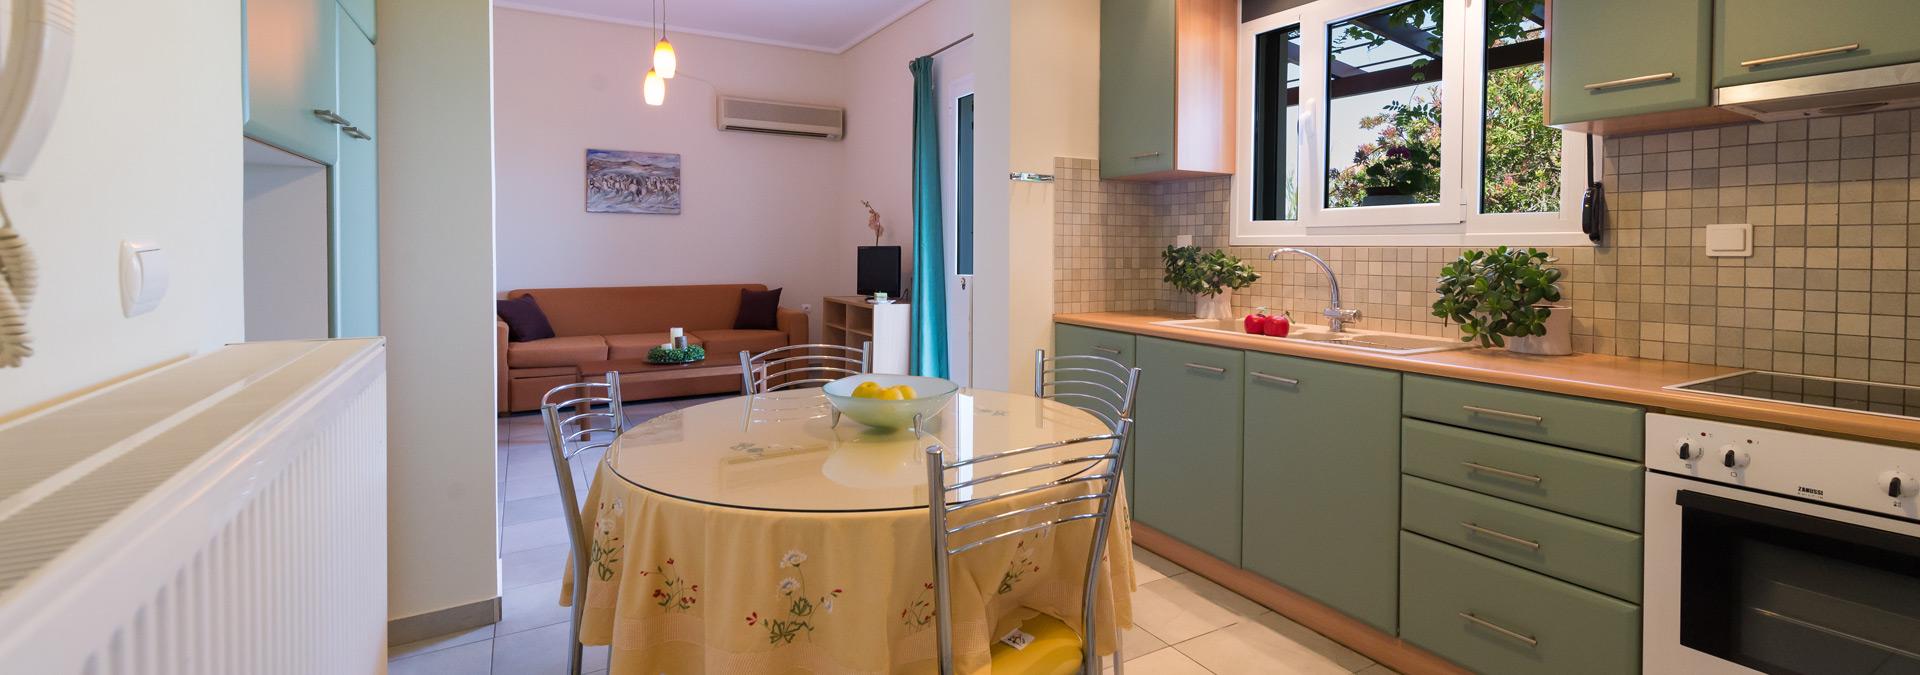 kefalonia_apartments_2_b1